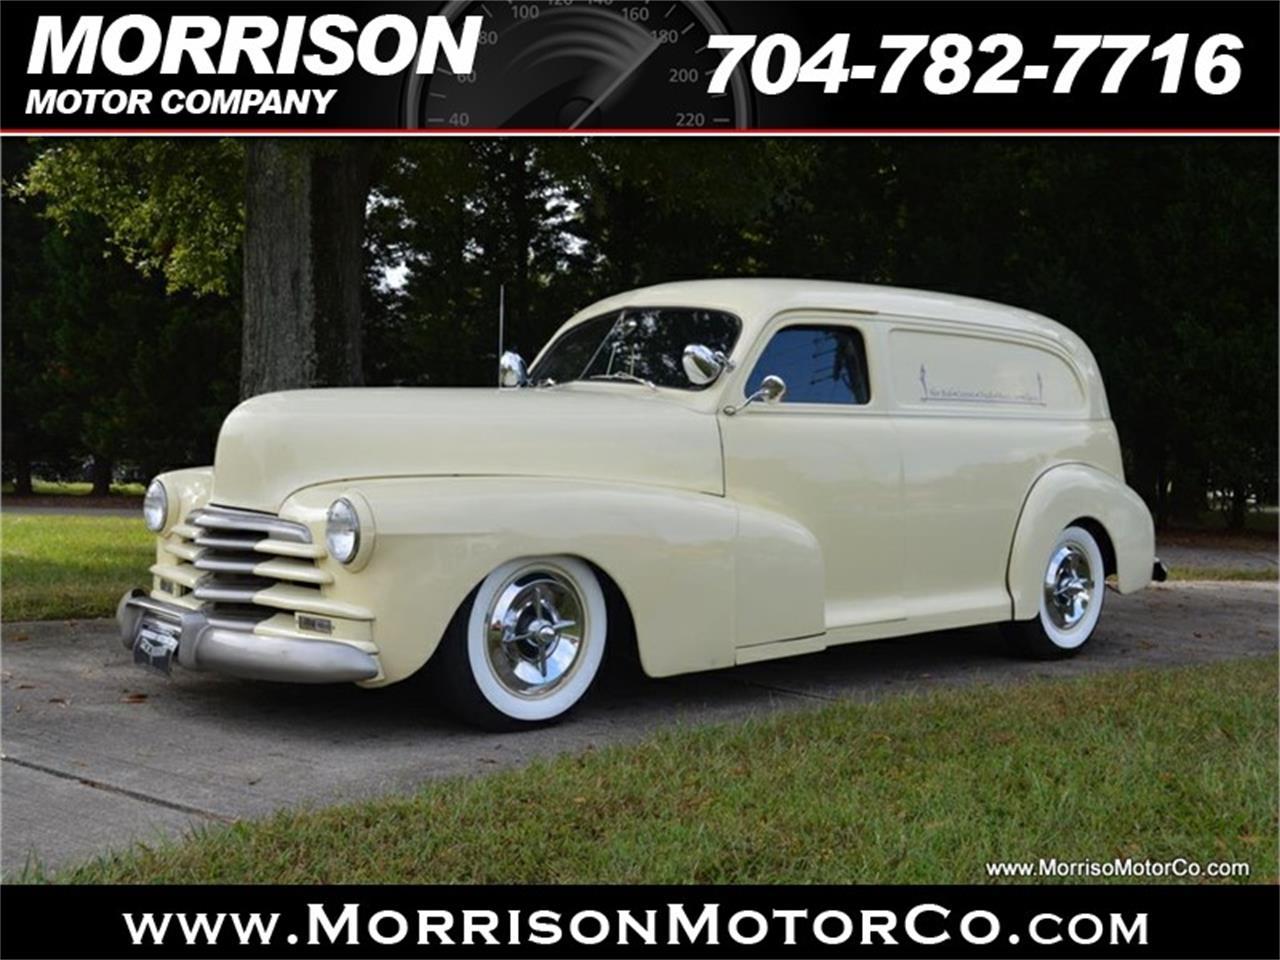 For Sale 1948 Chevrolet Sedan Delivery In Concord North Carolina